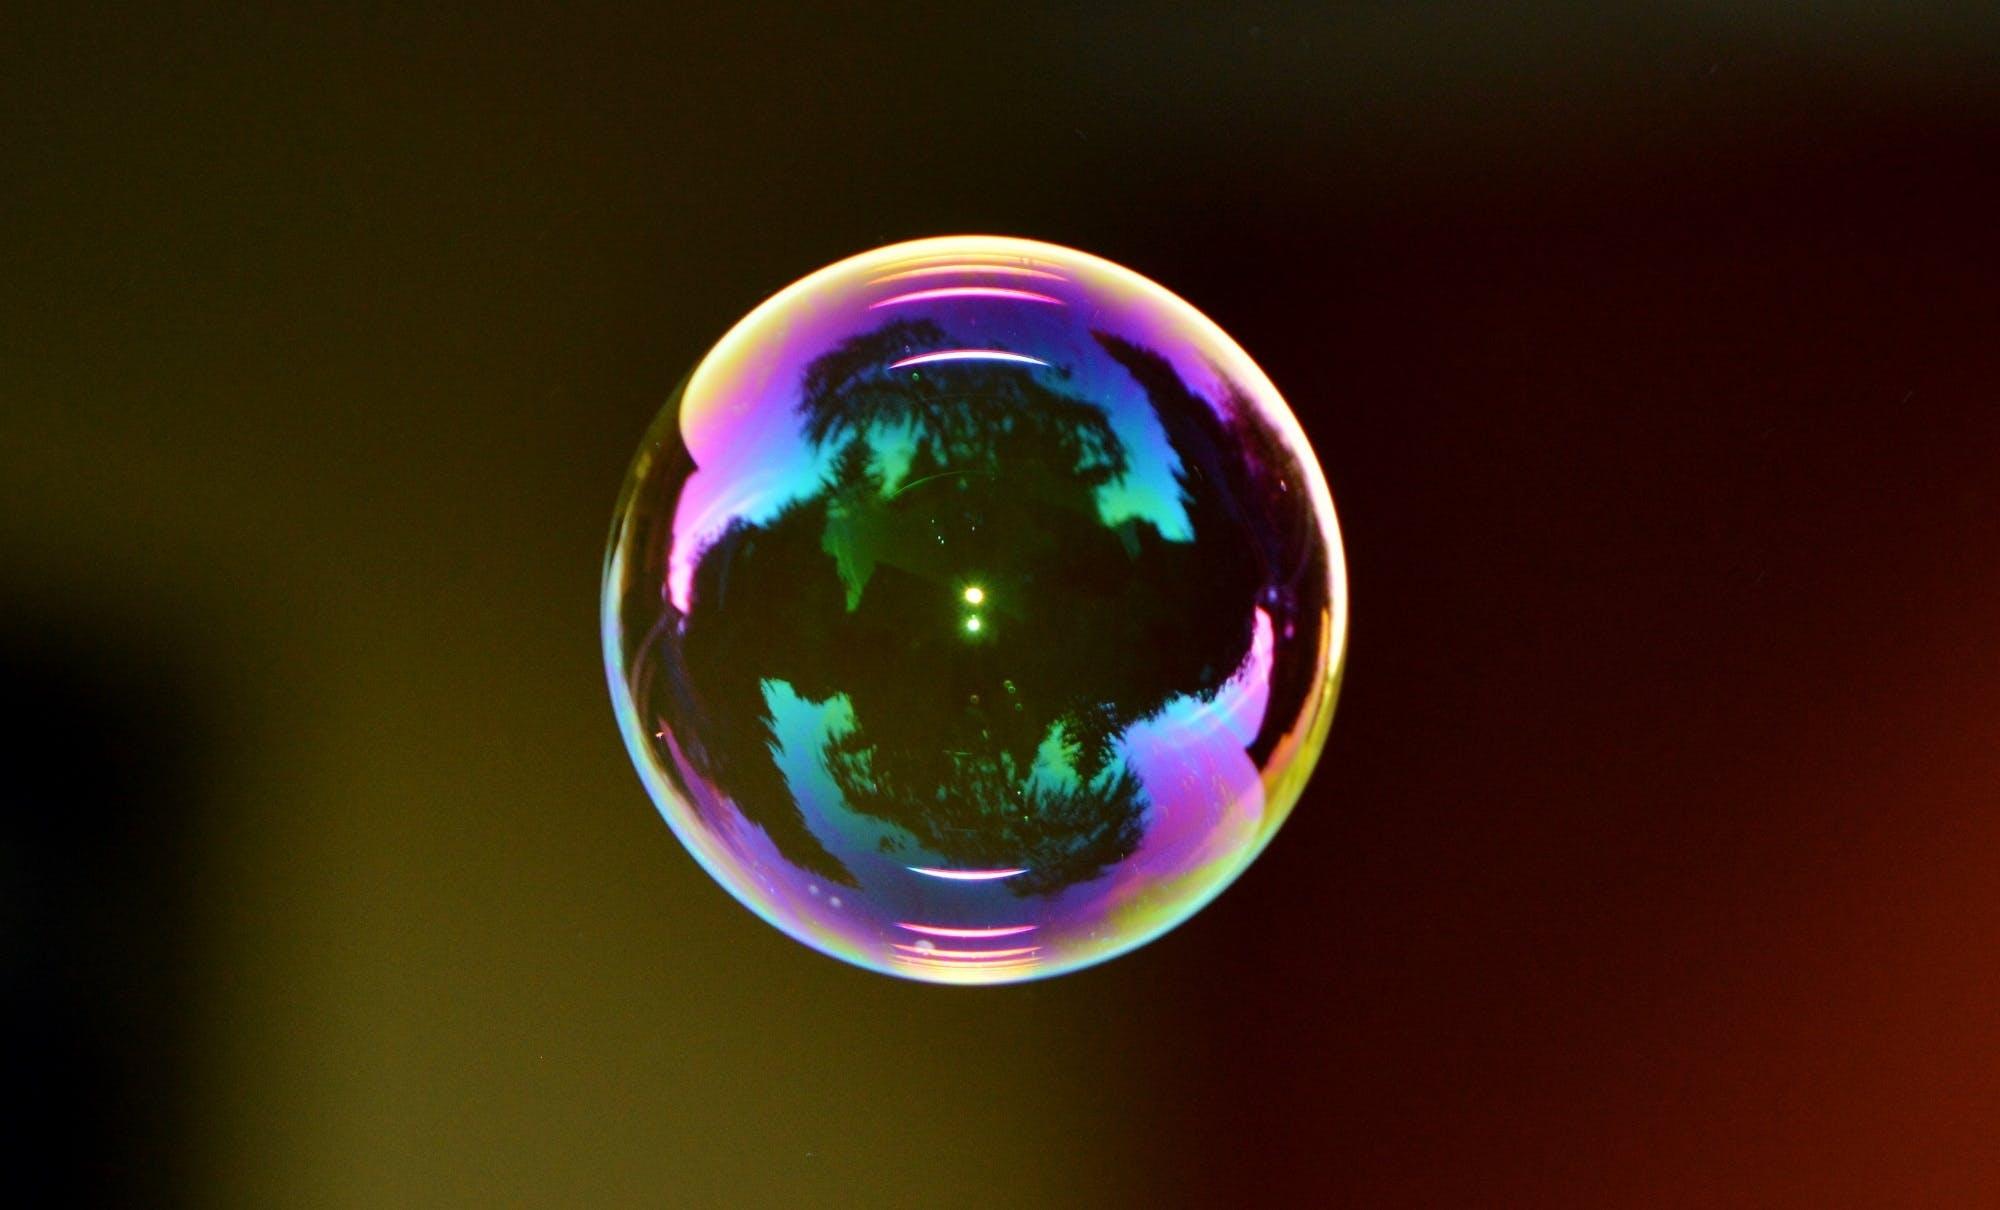 Macro Focus Photo of a Bubble